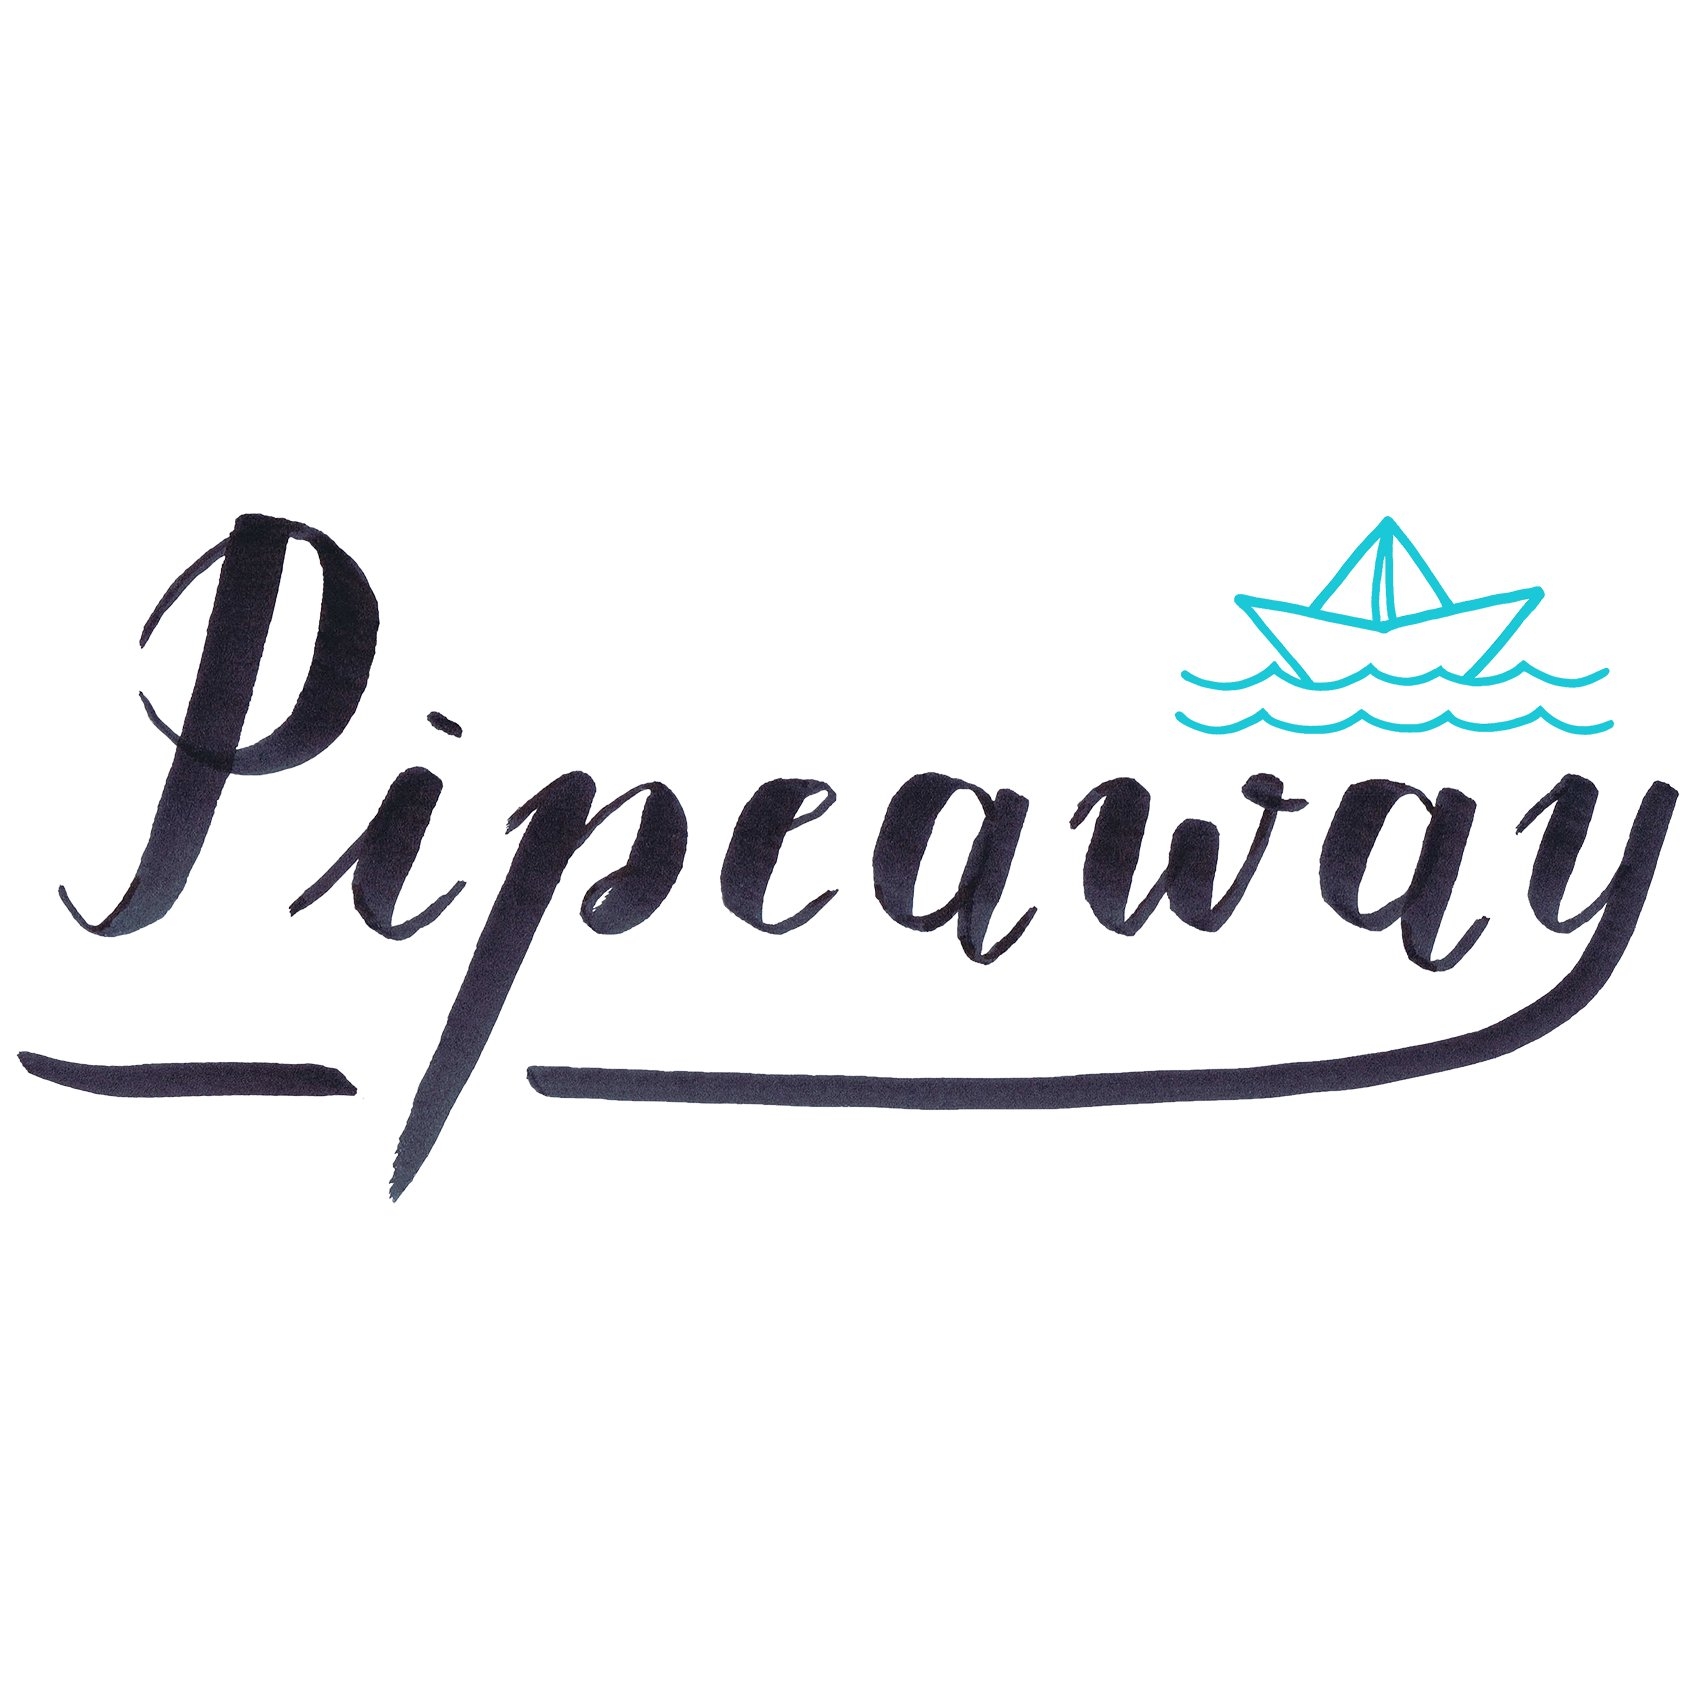 Pipeaway